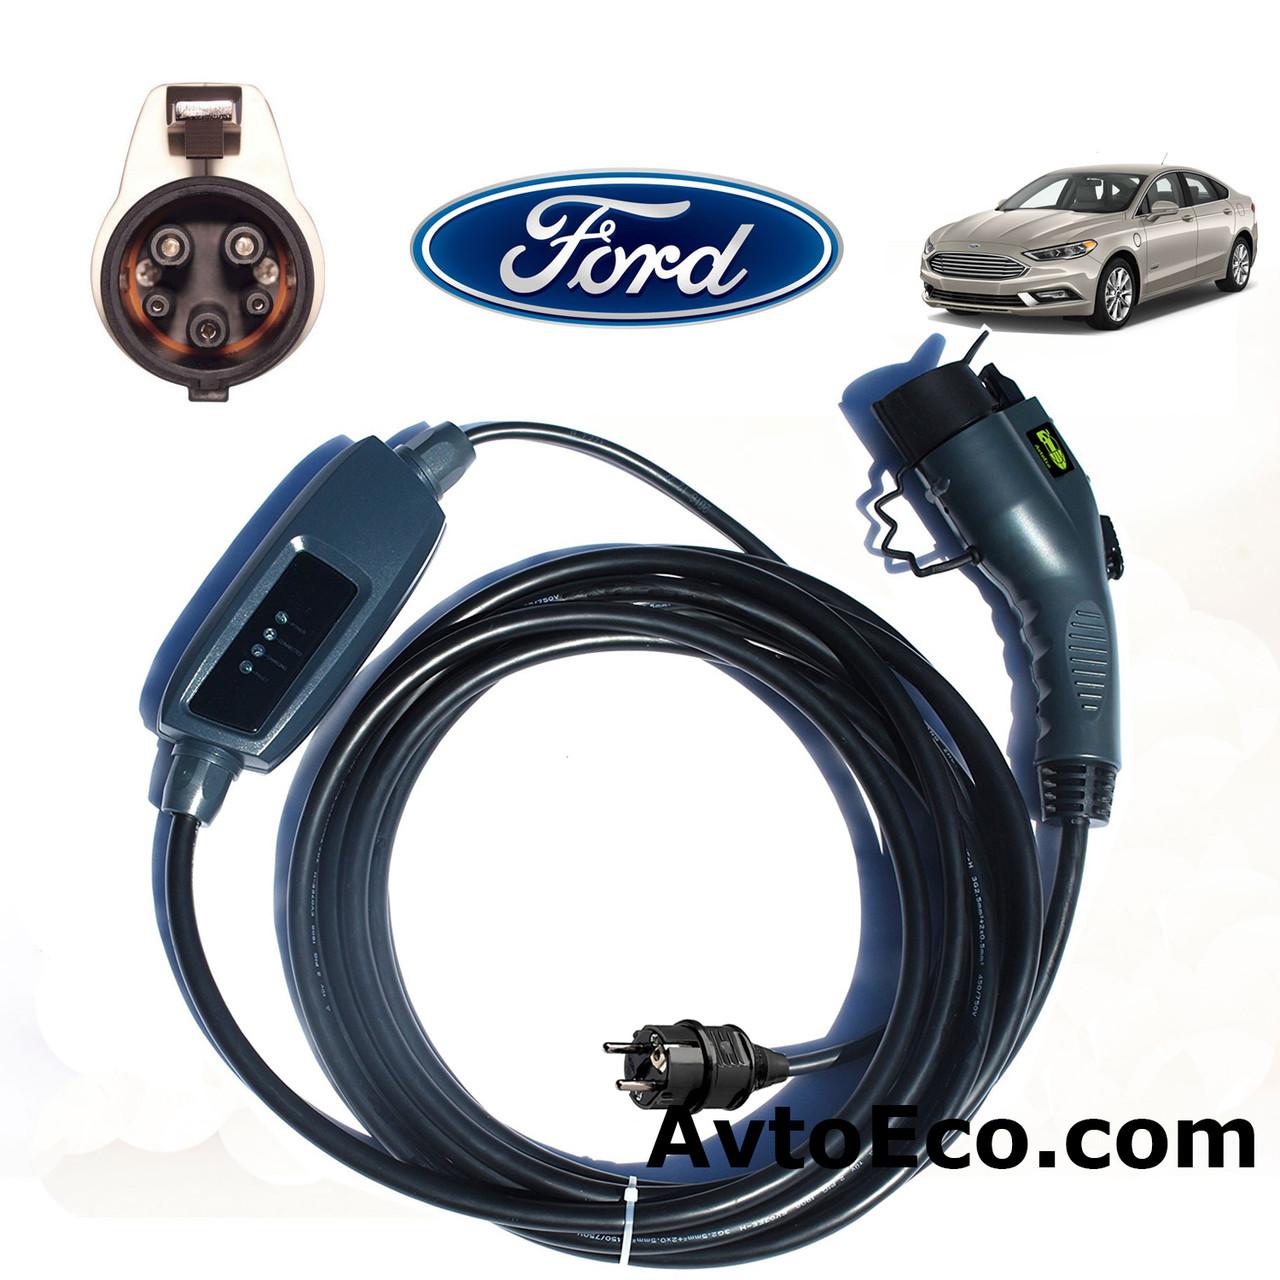 Зарядное устройство для электромобиля Ford Fusion Energi Duosida J1772-16A